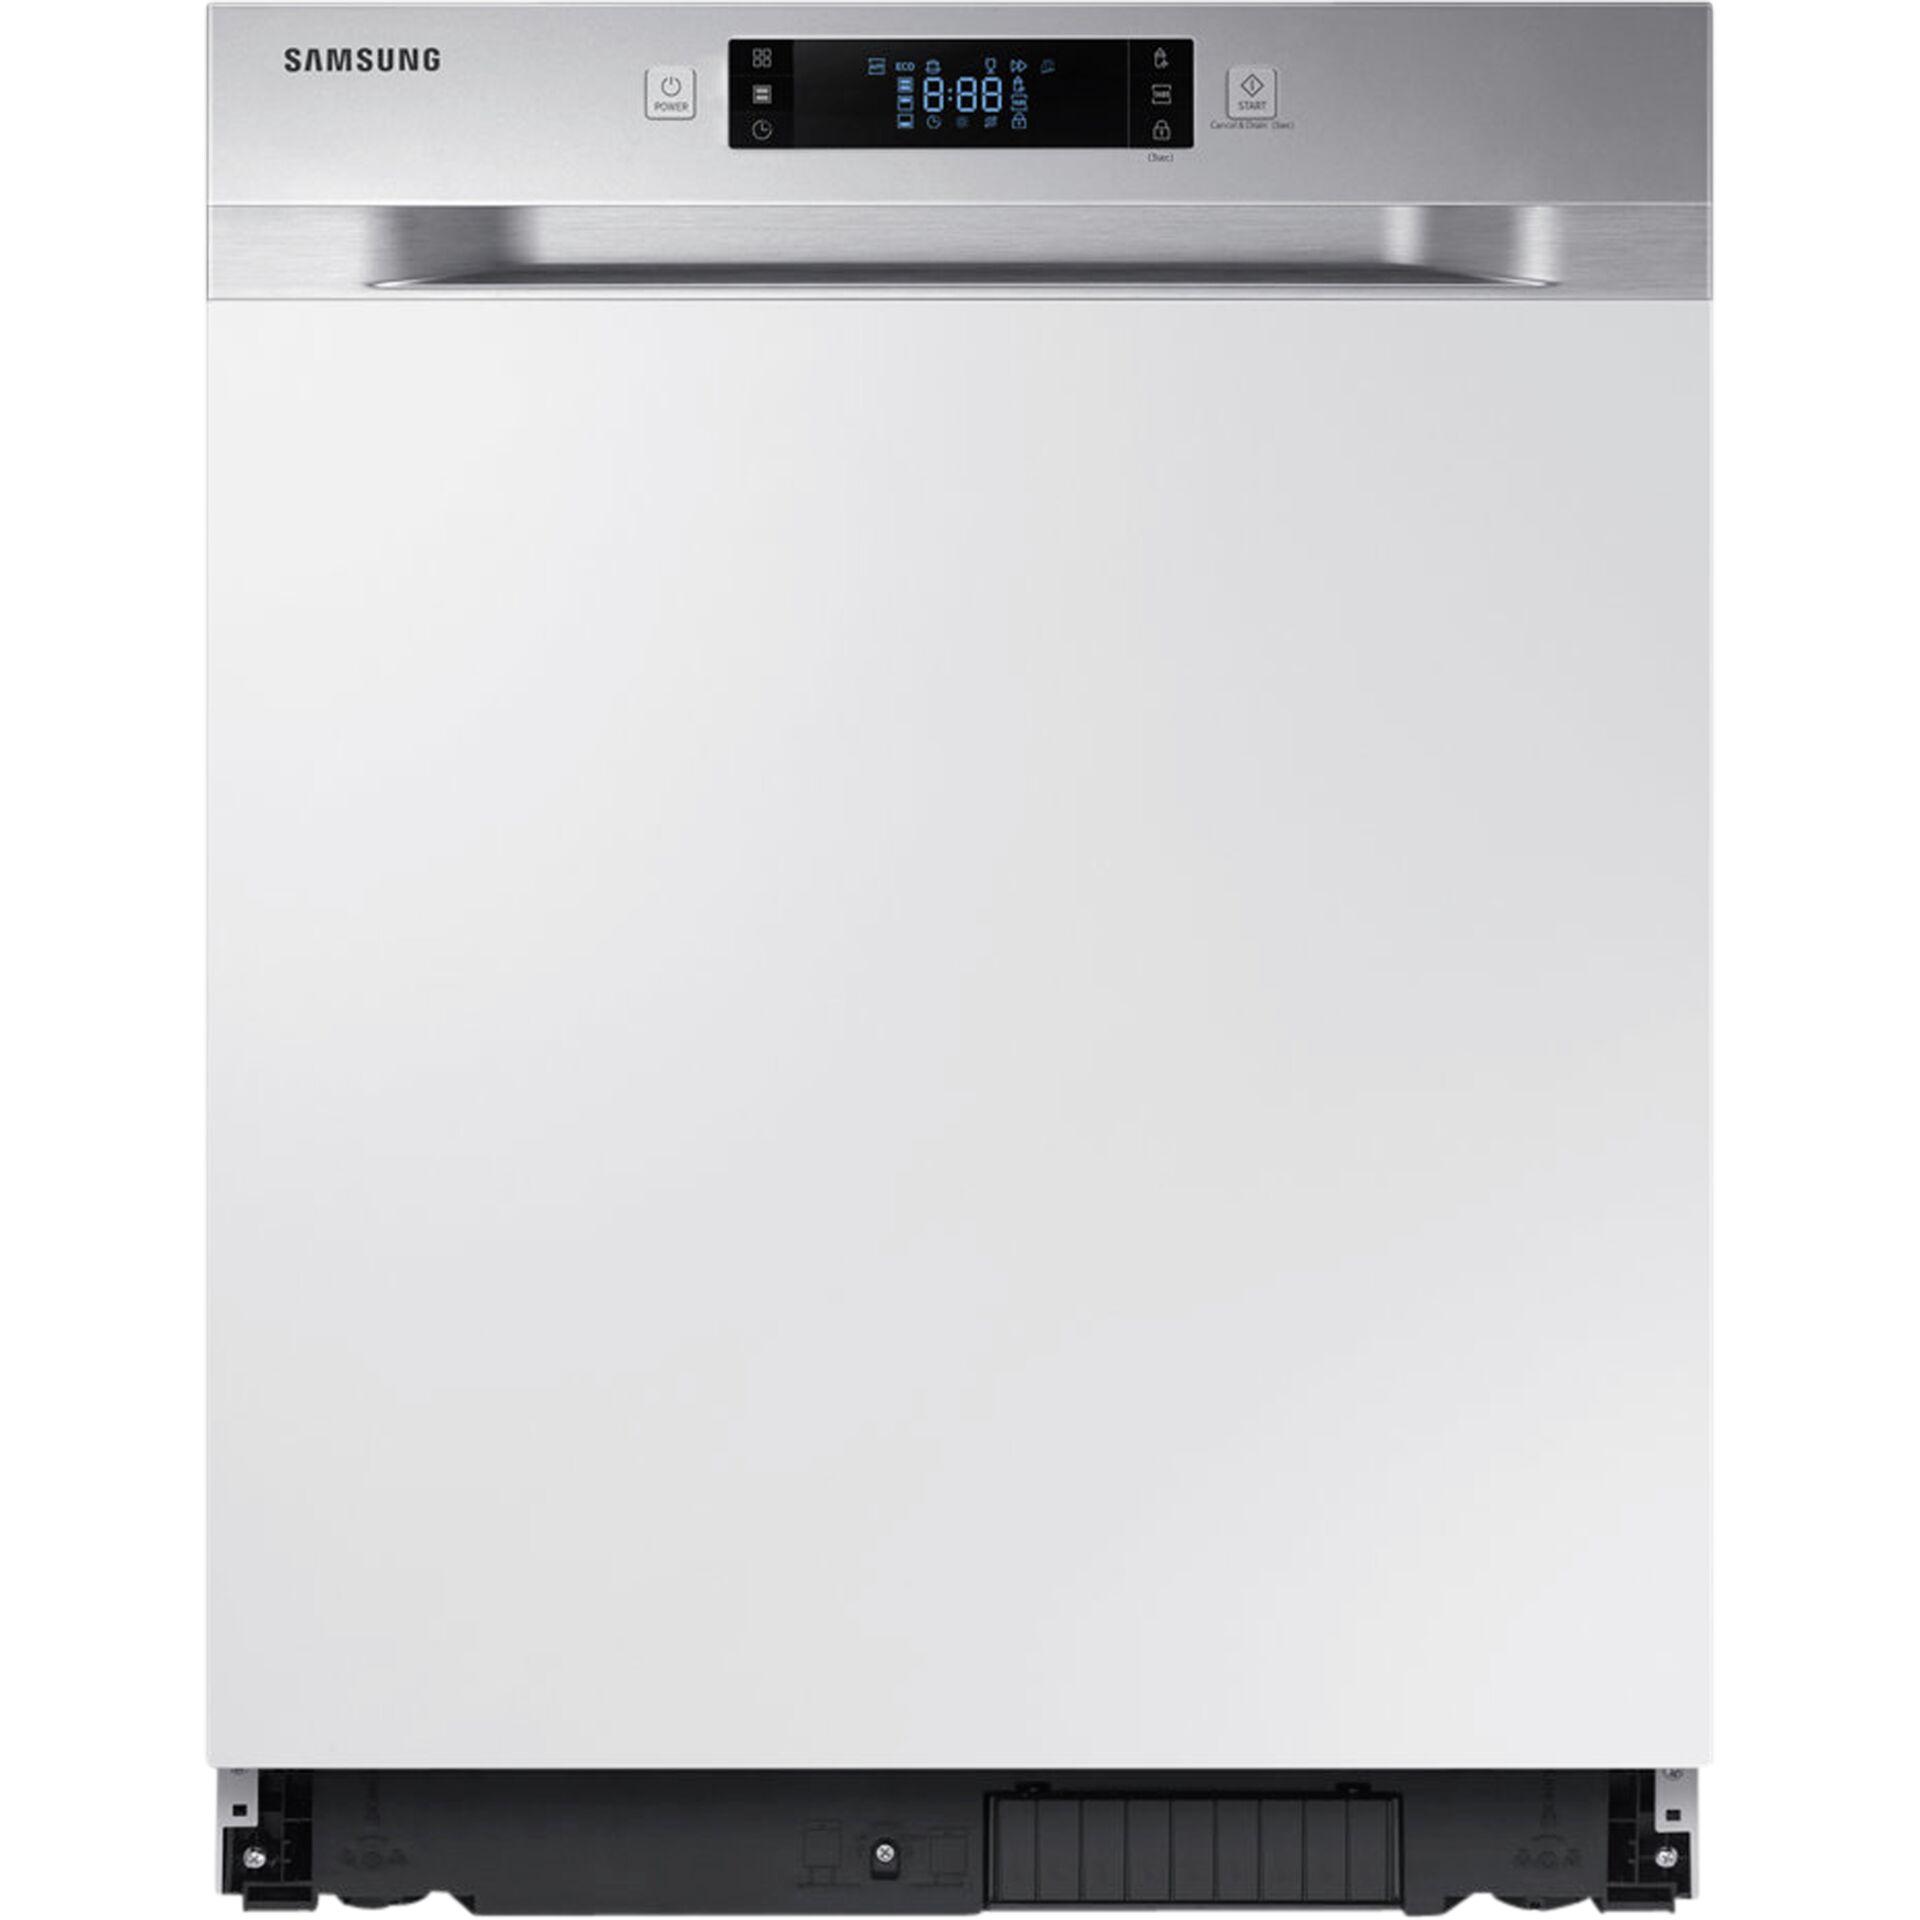 Samsung DW60M6040SS/EG